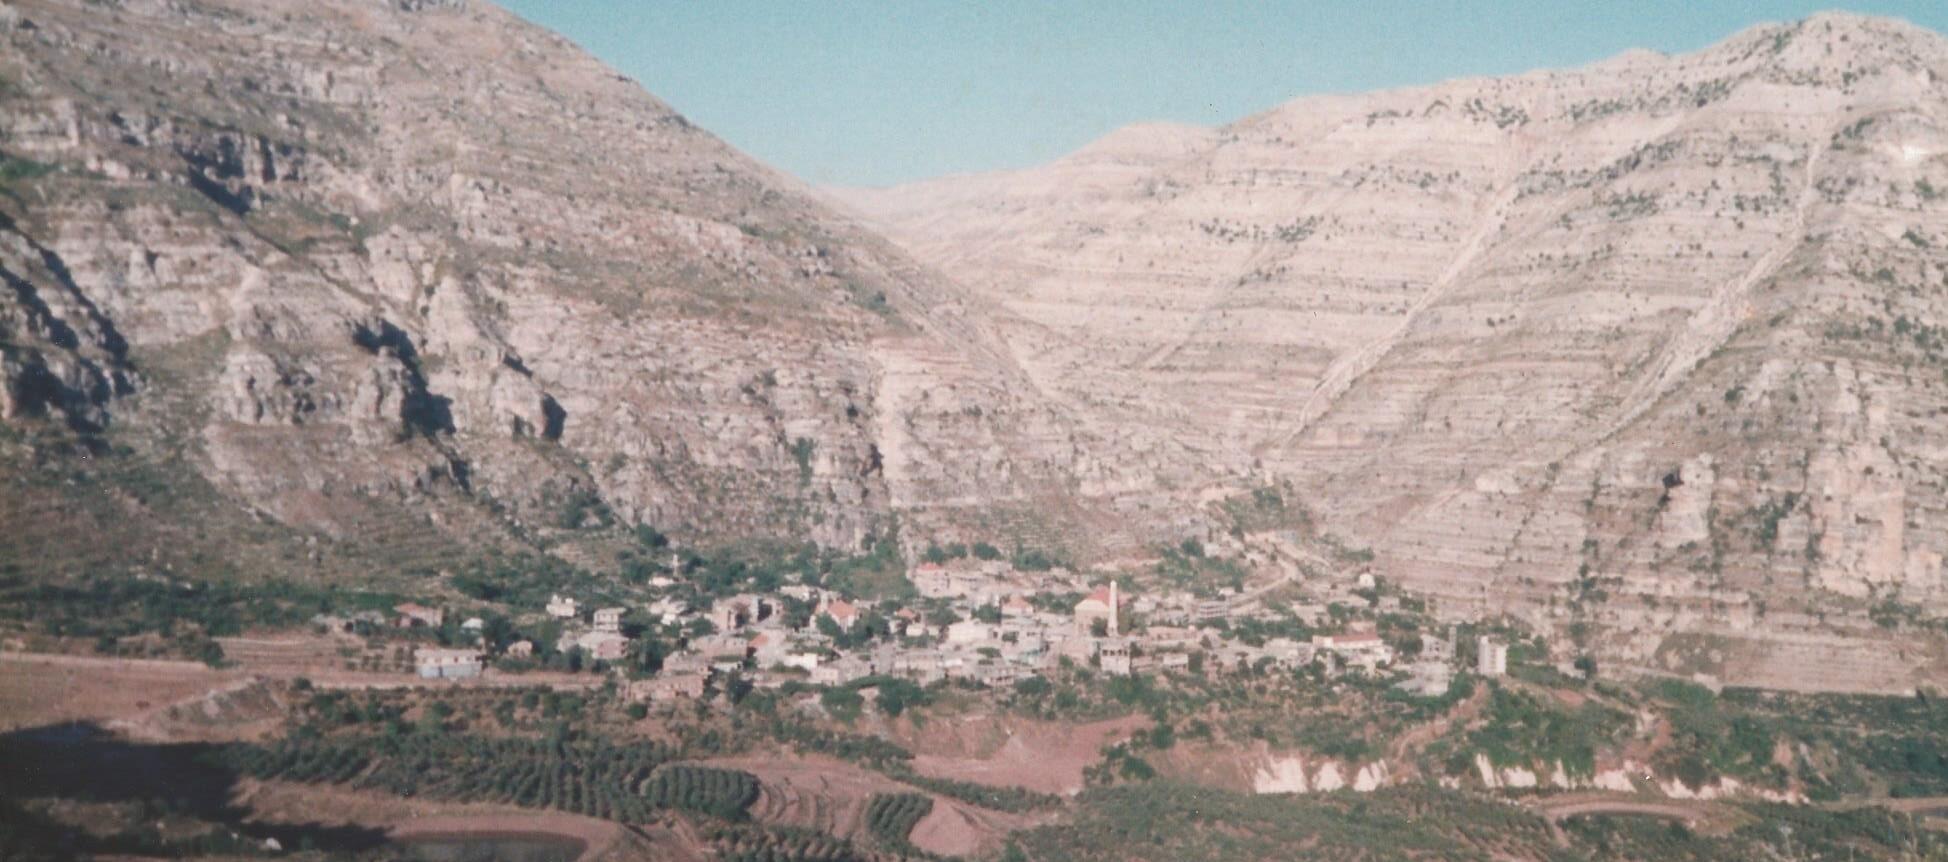 Akoura lebanon